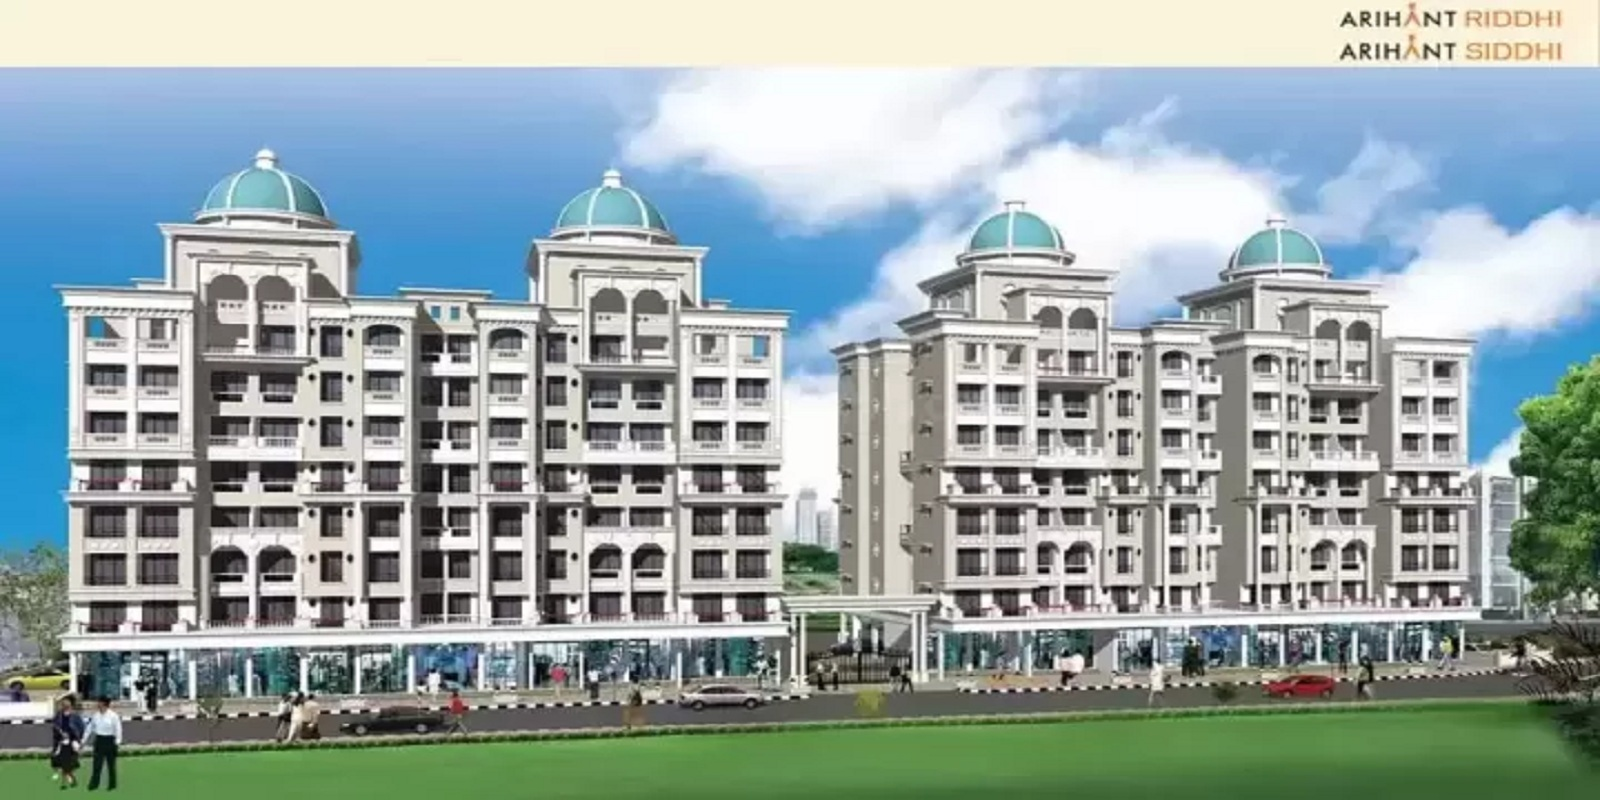 arihant riddhi project large image3